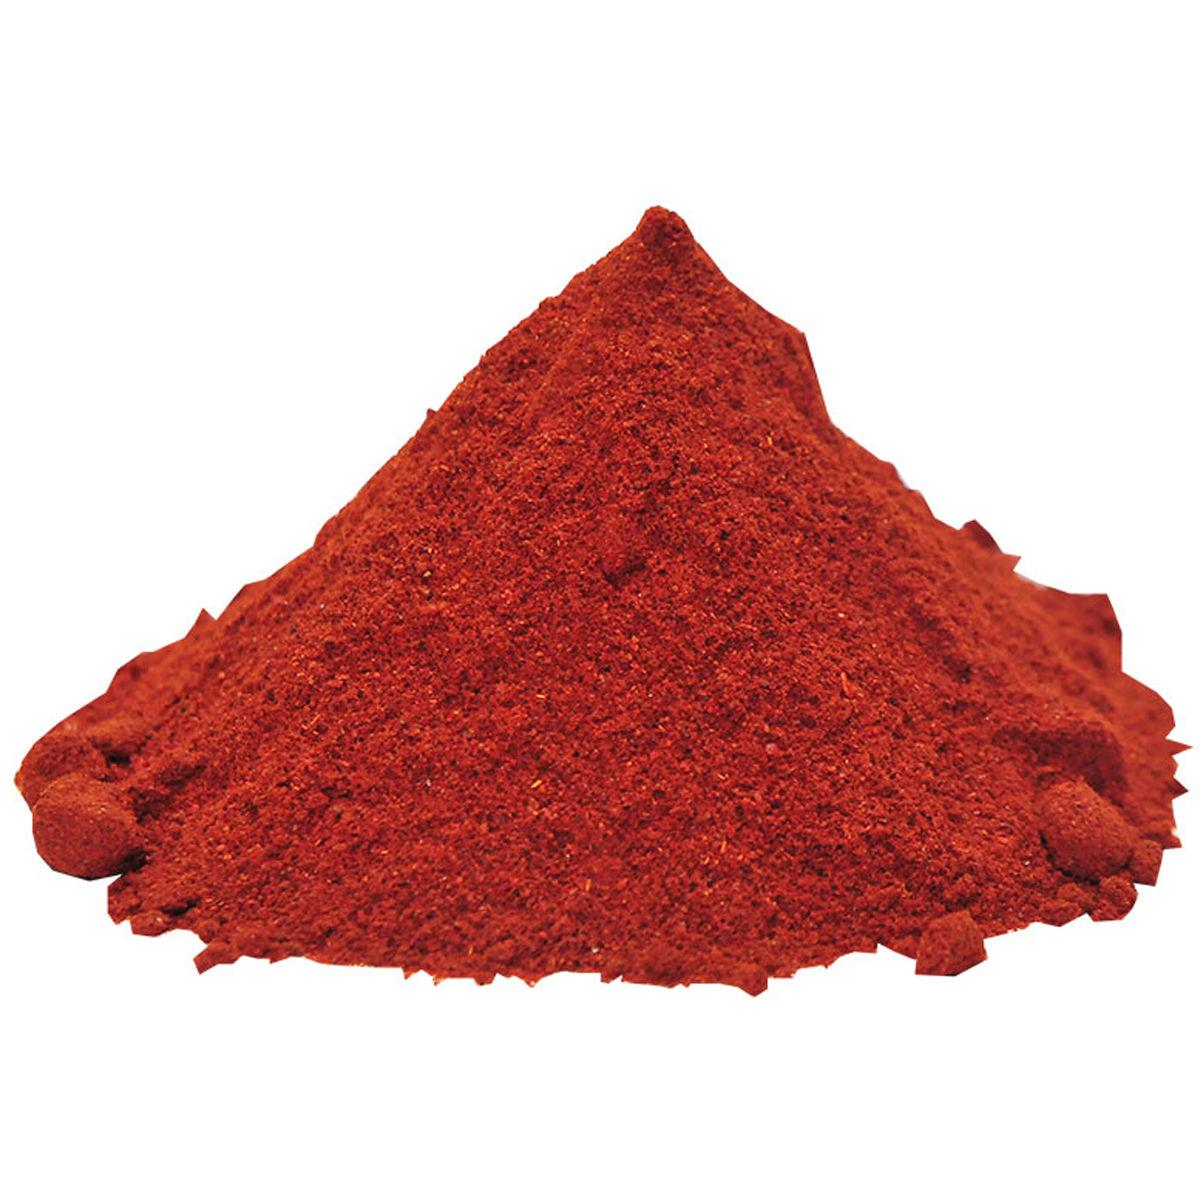 Kırmızı Toz Biber 1KG